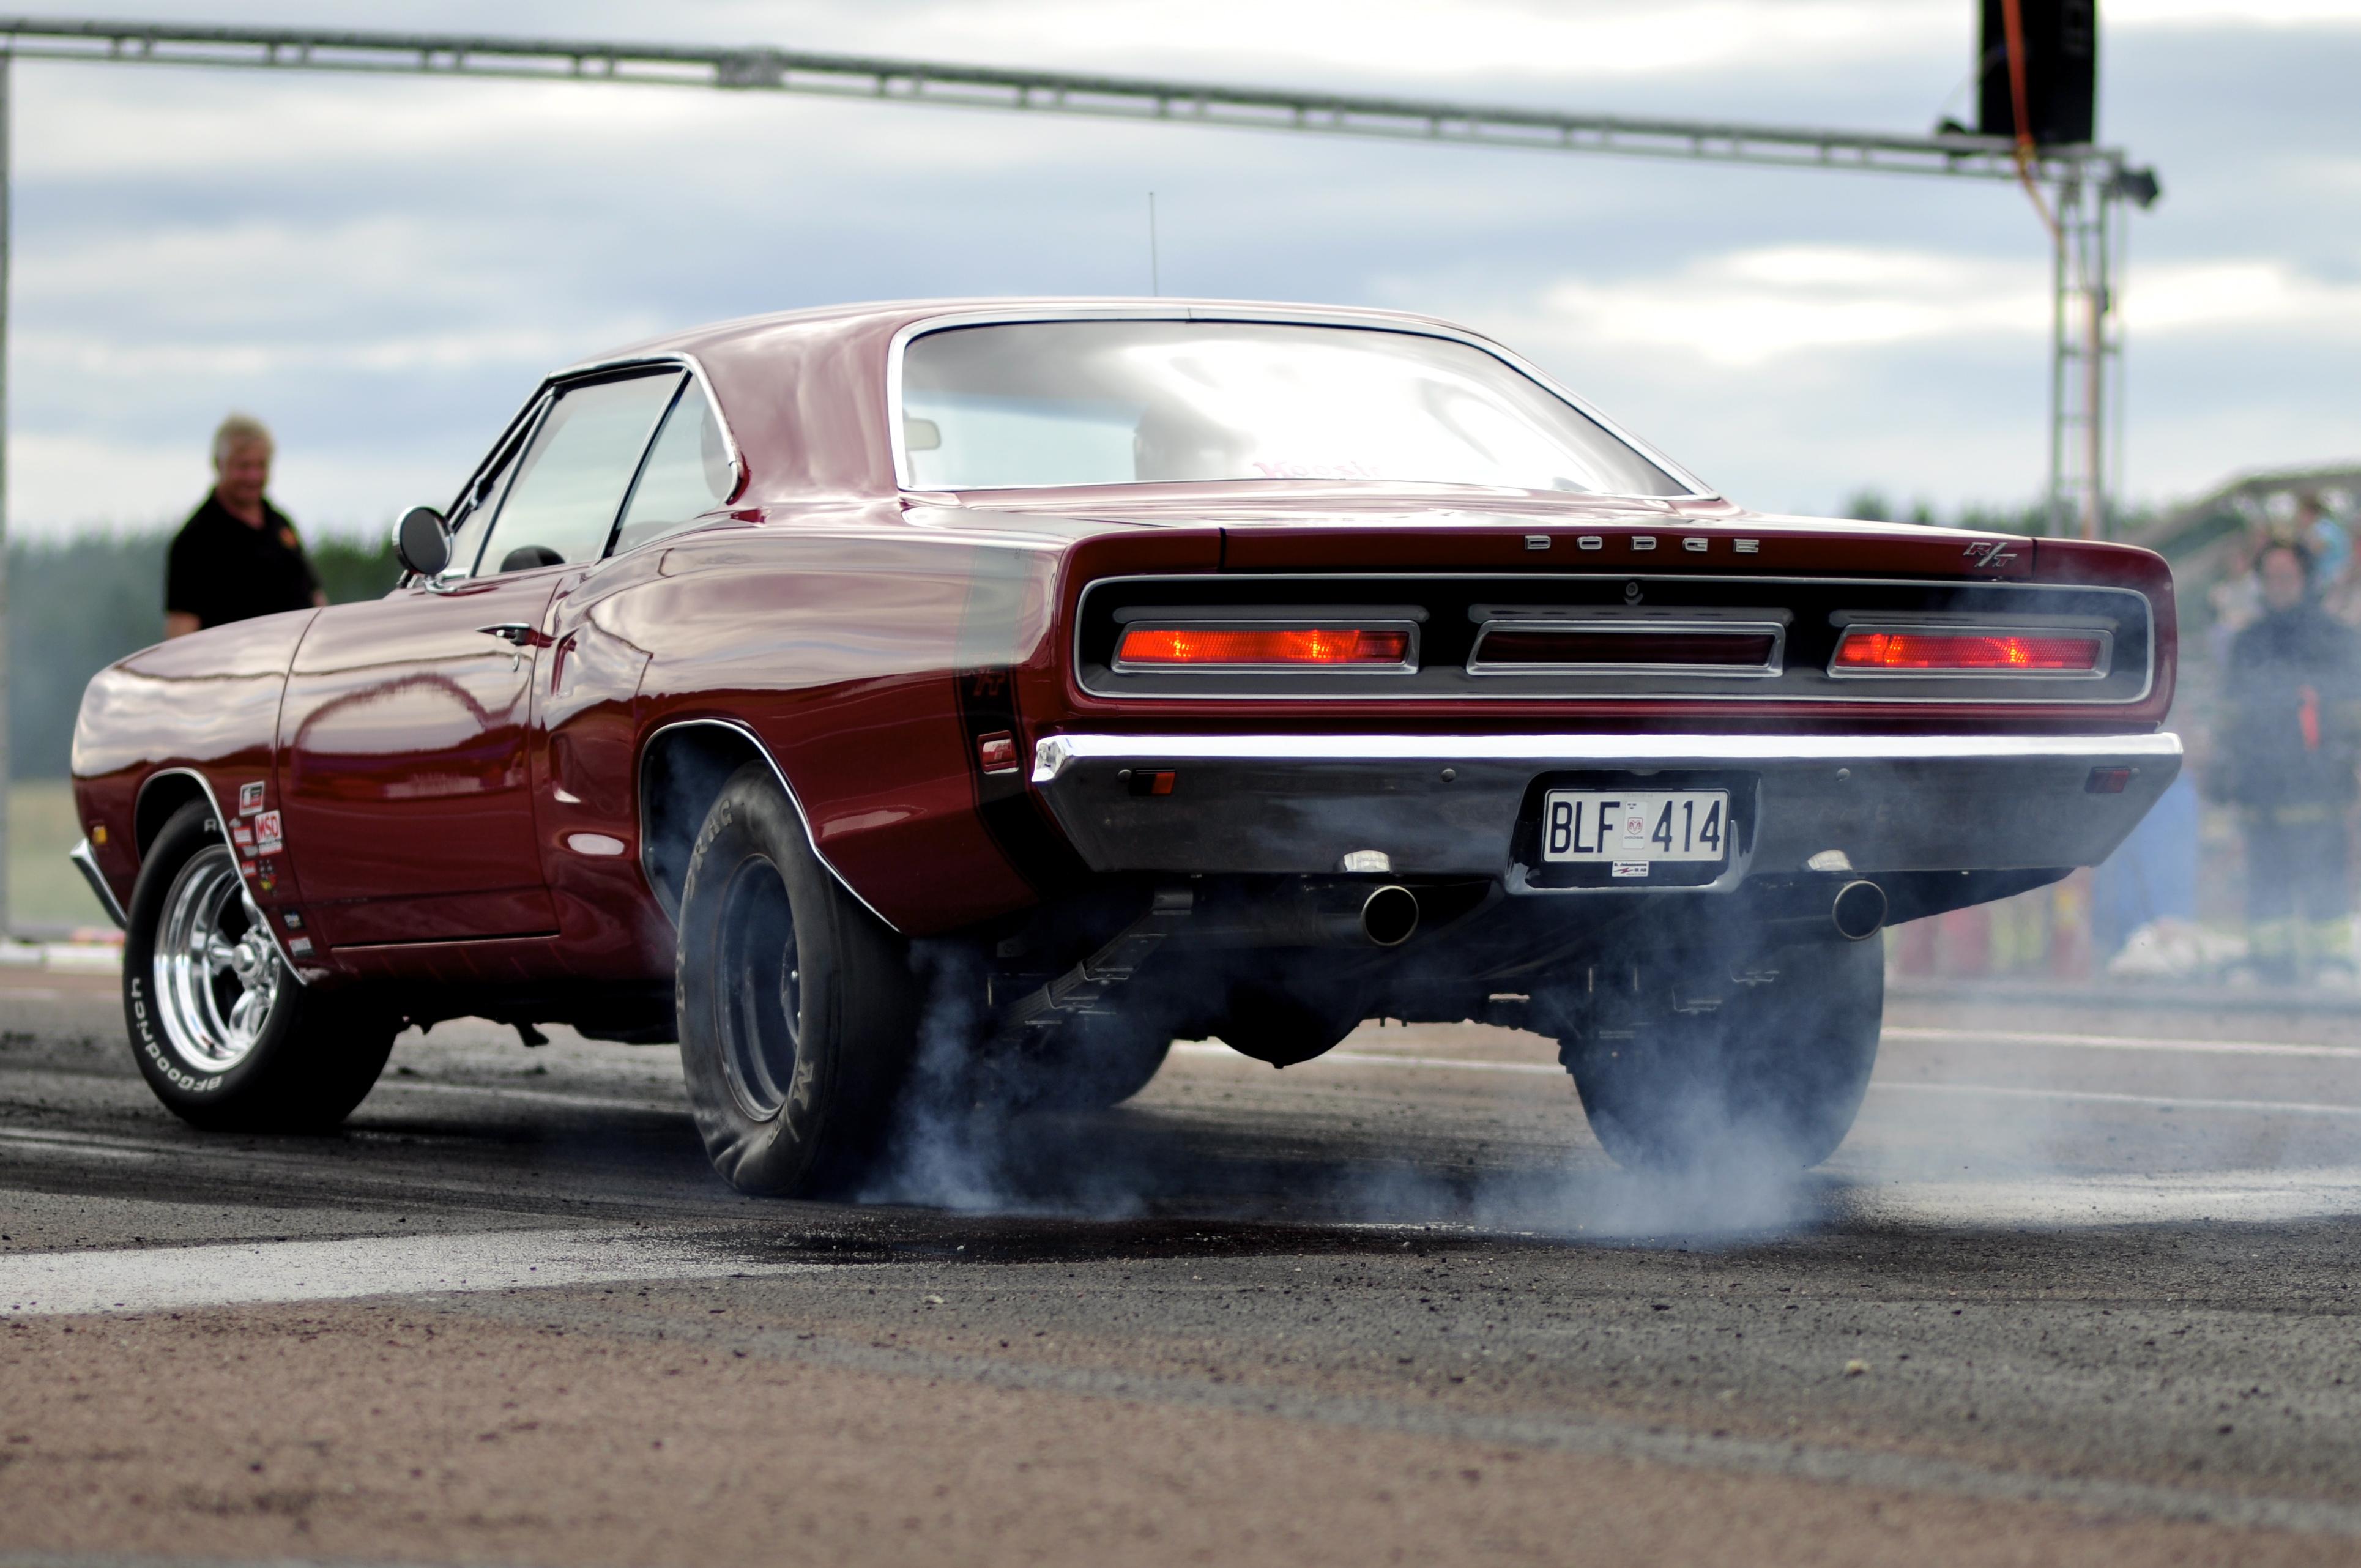 Wallpaper : 1969, race, vintage, drag, mt, stripe, scat, racing, Bee, pack,  strip, stuff, Dodge, Chrysler, mopar, bumble, sthlm, coronet, 440, rt,  magnum, ...